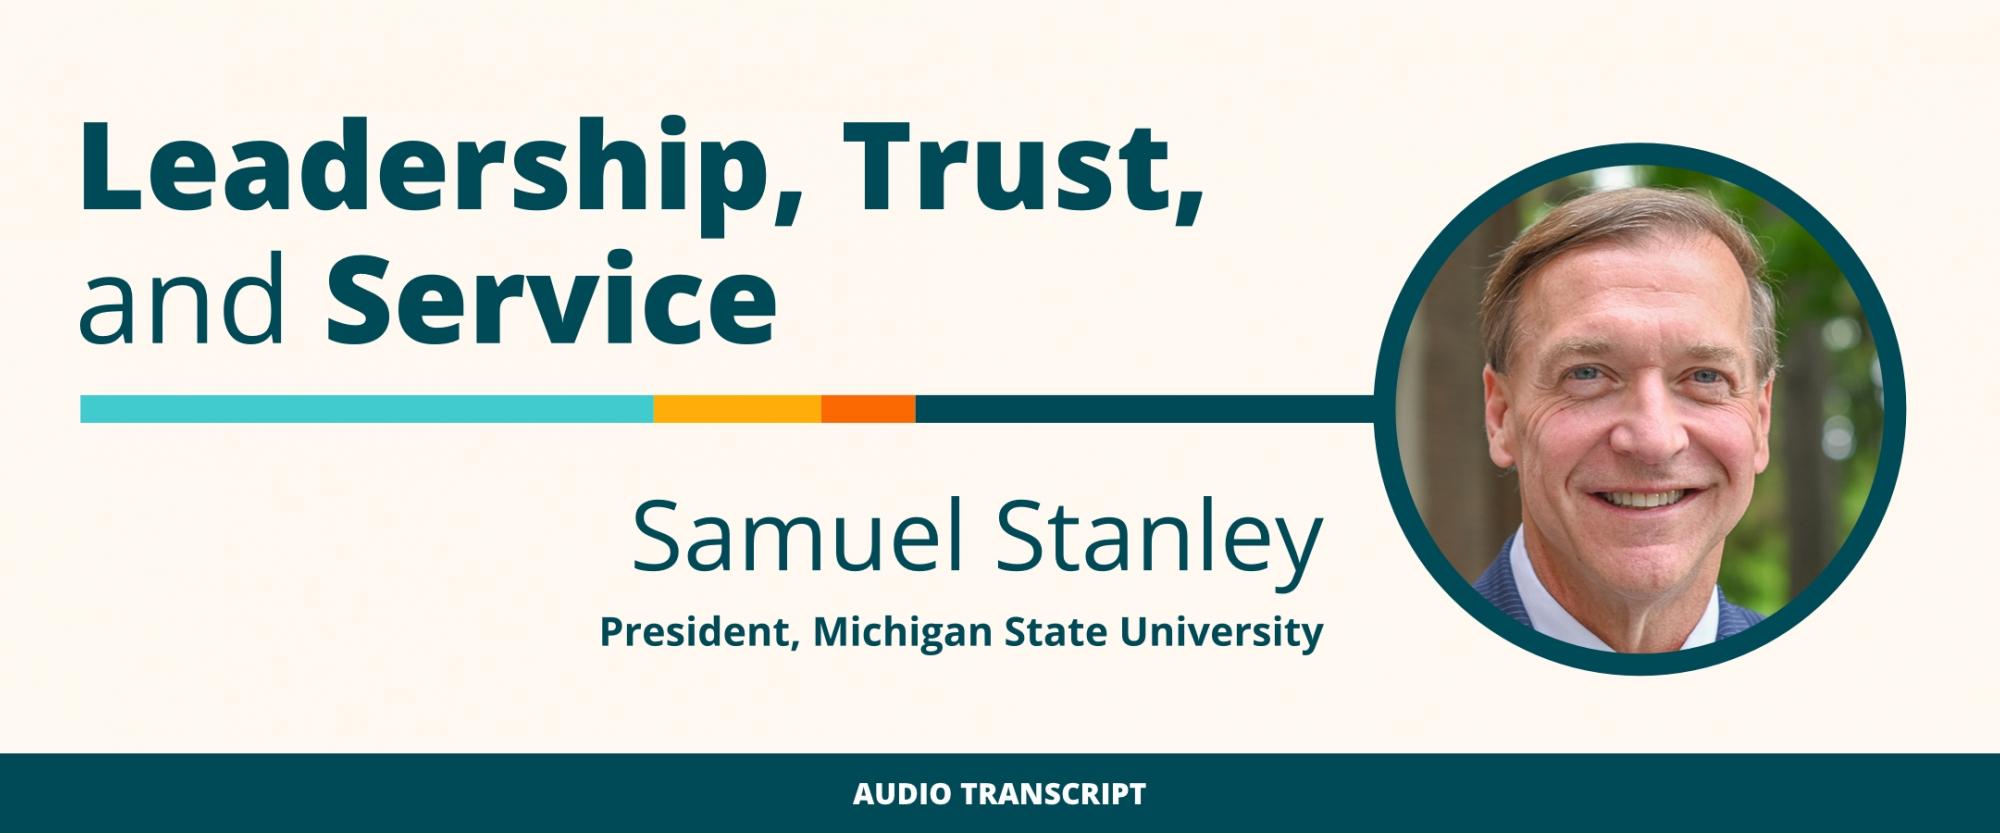 Weekly Wisdom 5/24/21: Transcript of Conversation With Samuel Stanley, Michigan State University President